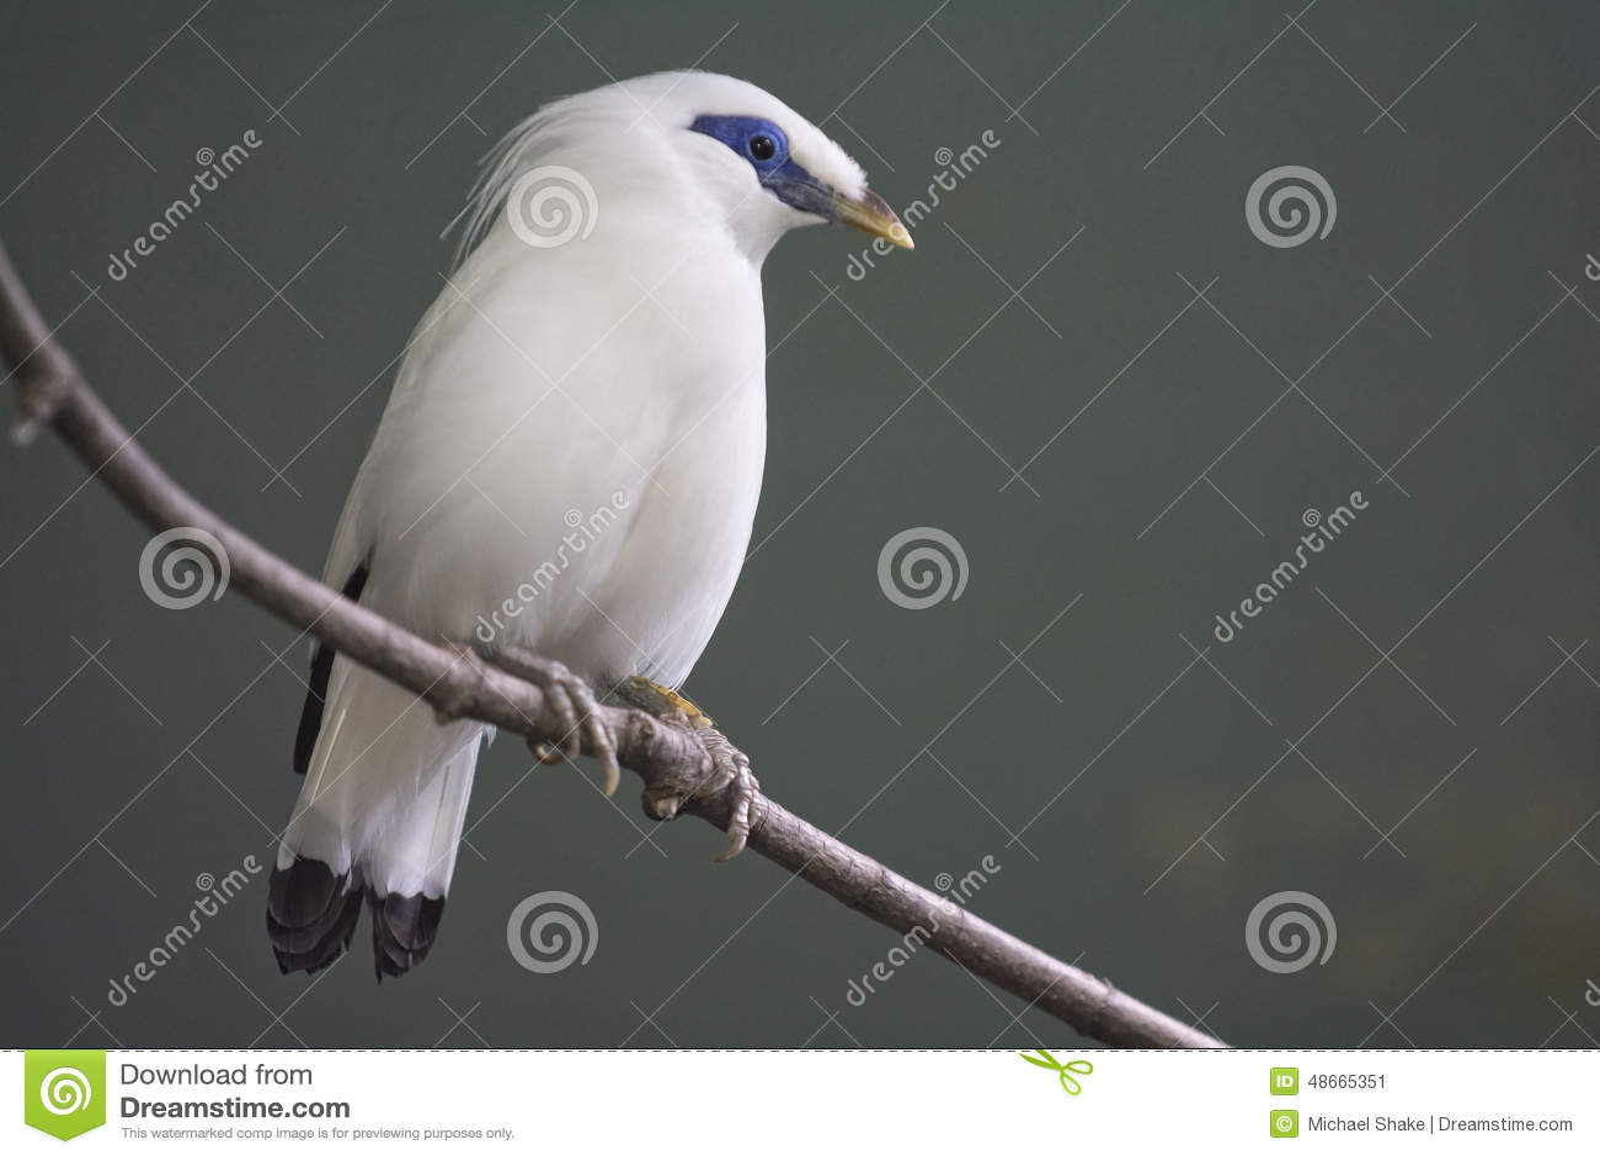 Bali Myna Bird Stock Image Image Of Blue Black Animal 48665351